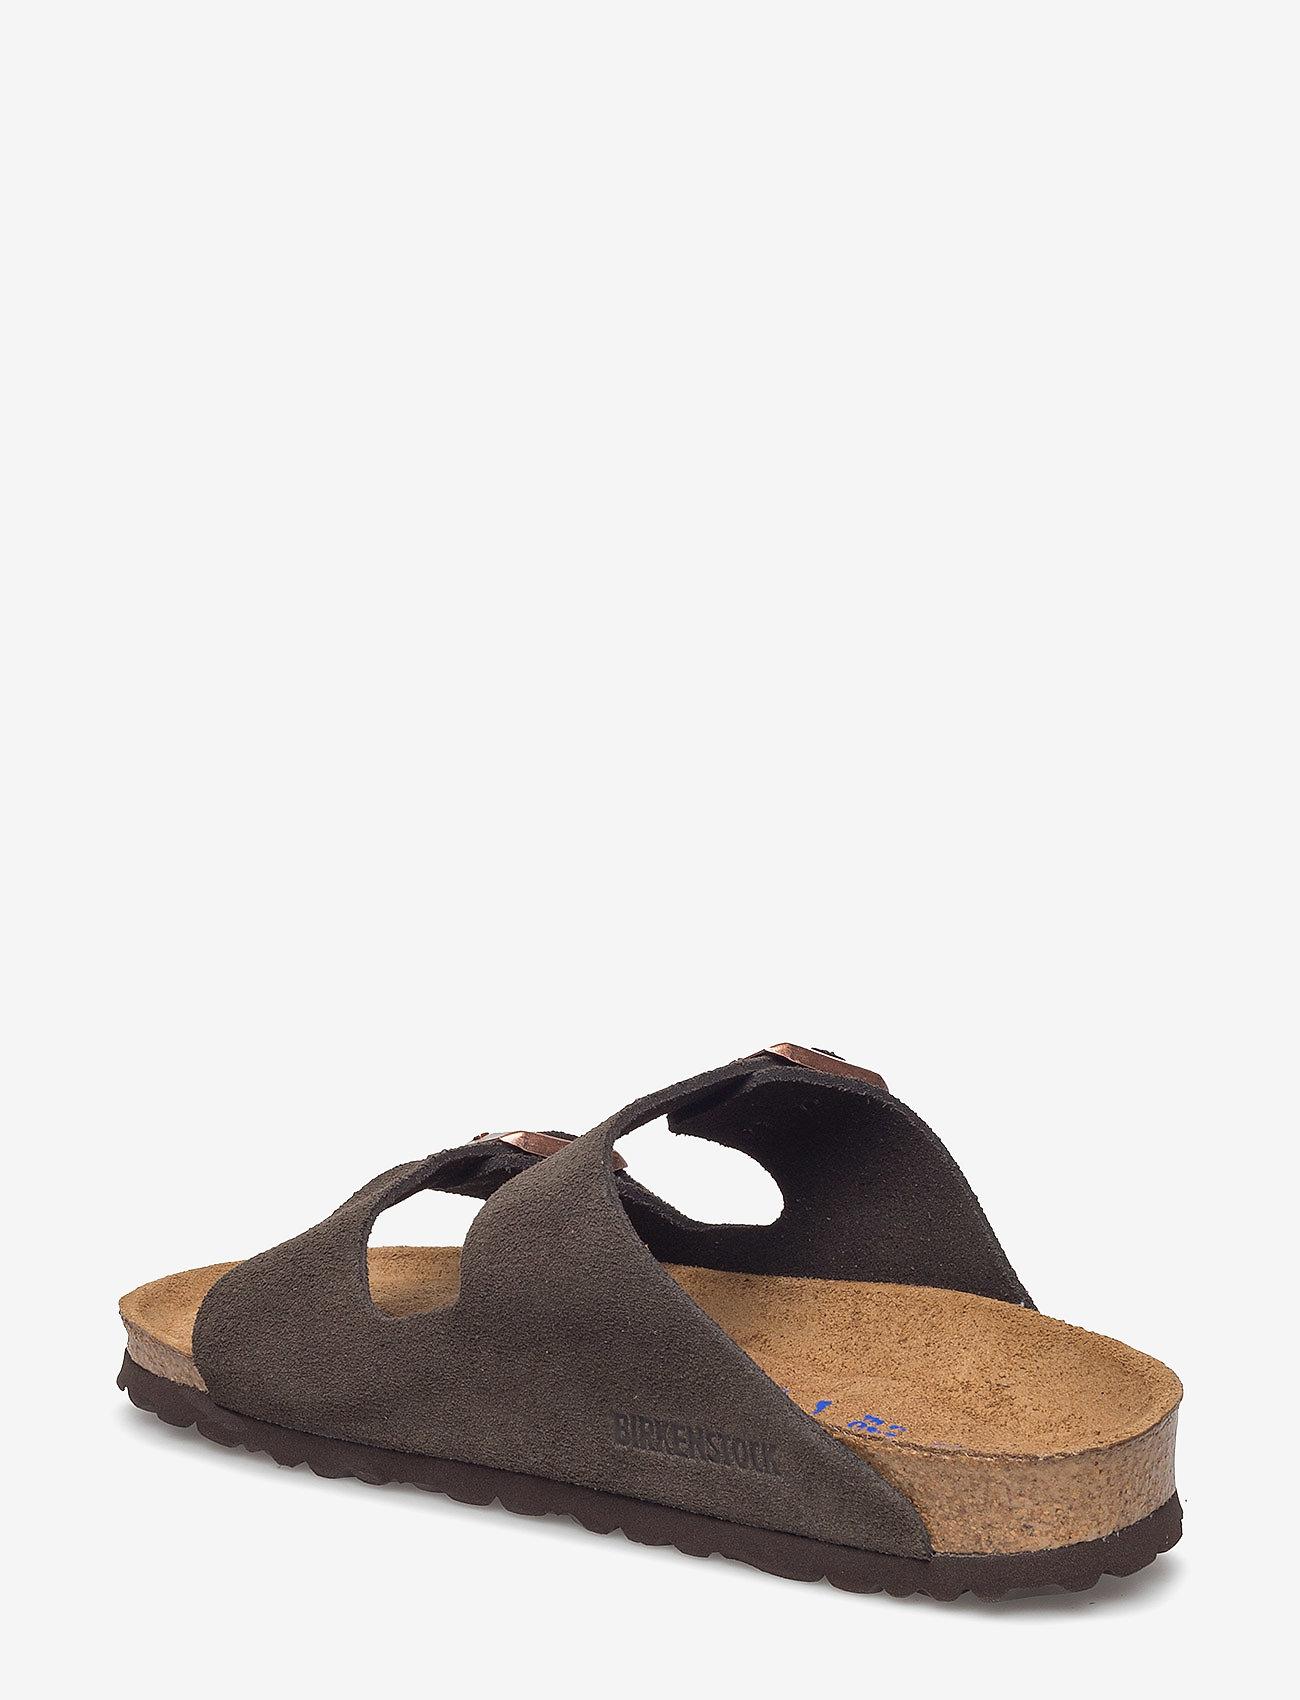 Birkenstock - Arizona Soft Footbed - mocca - 2